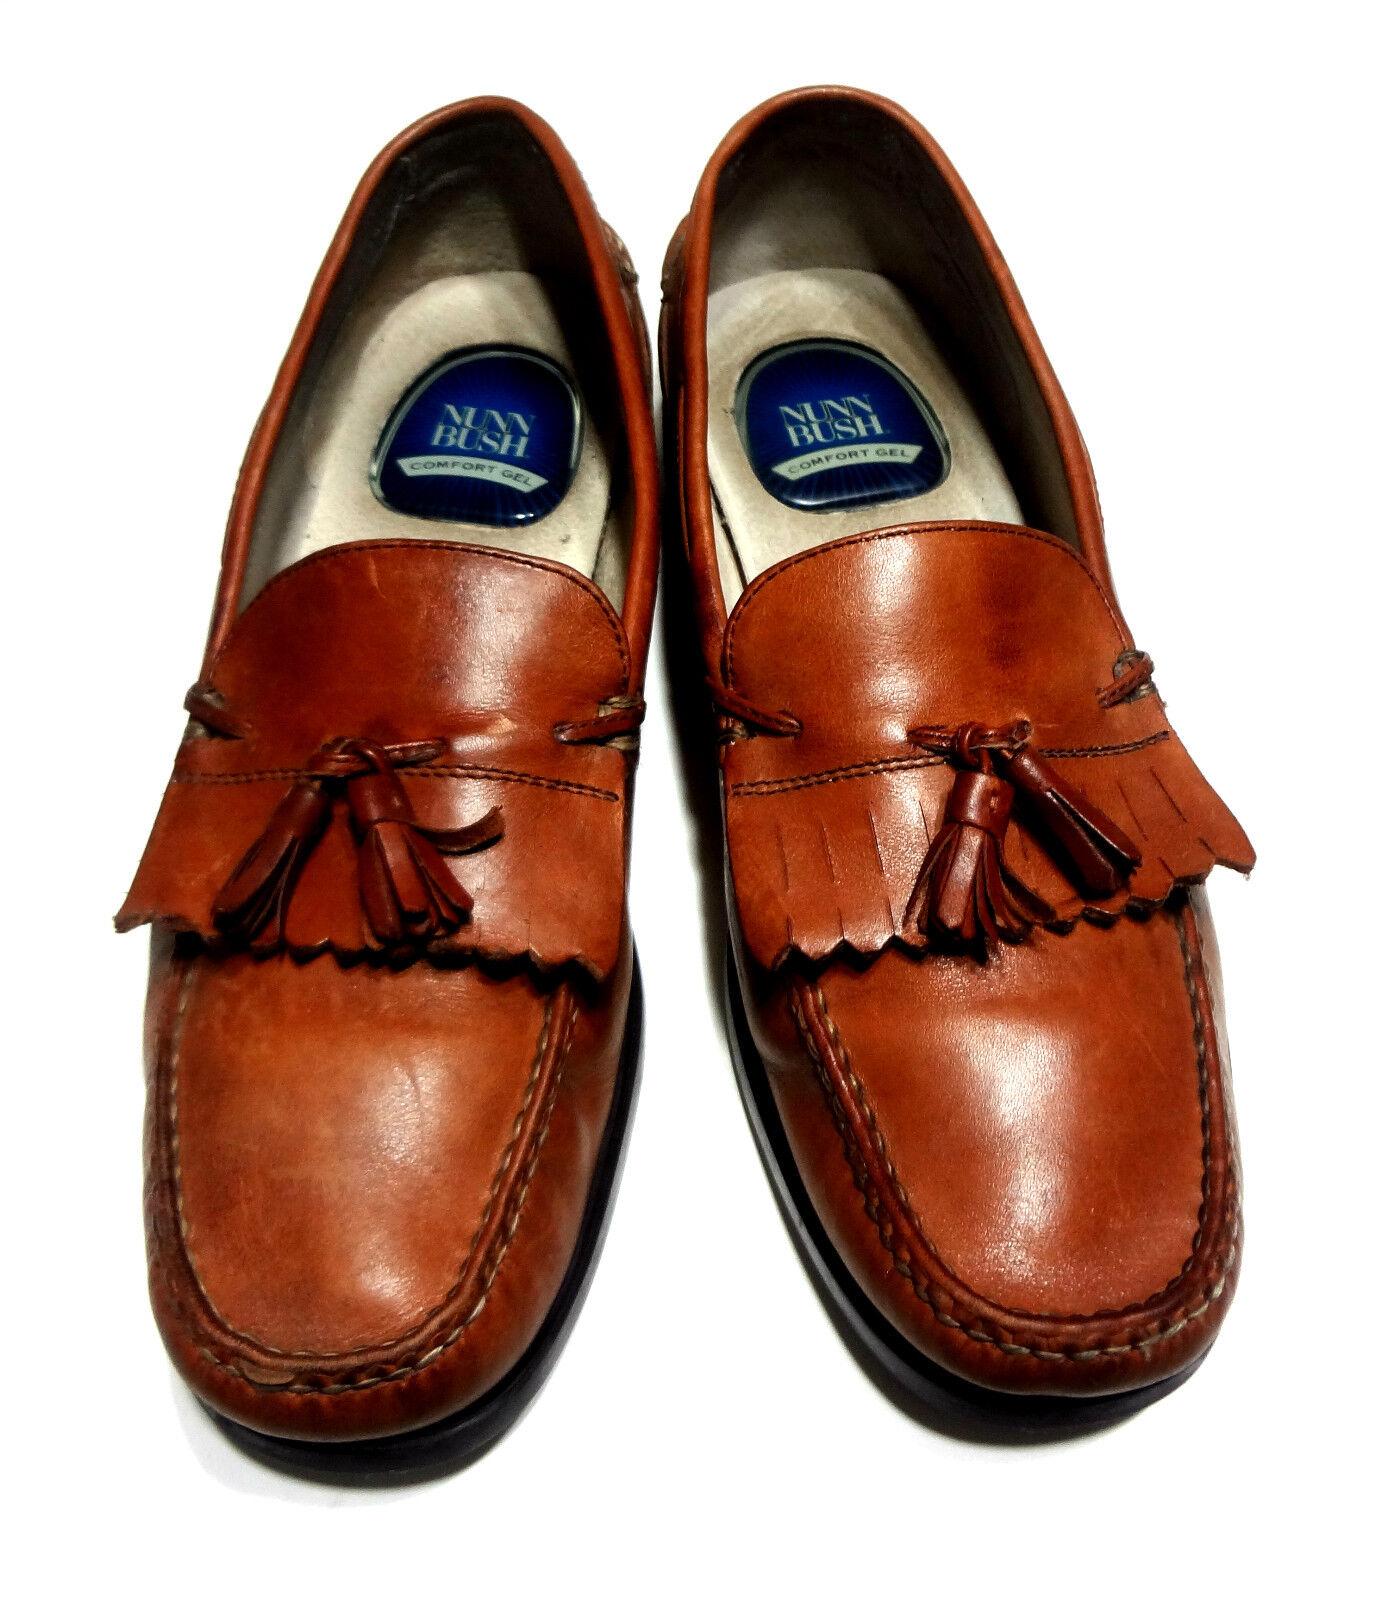 Nunn Bush Comfort Gel Loafers Tassel tan Leather Mens shoes 10.5 M